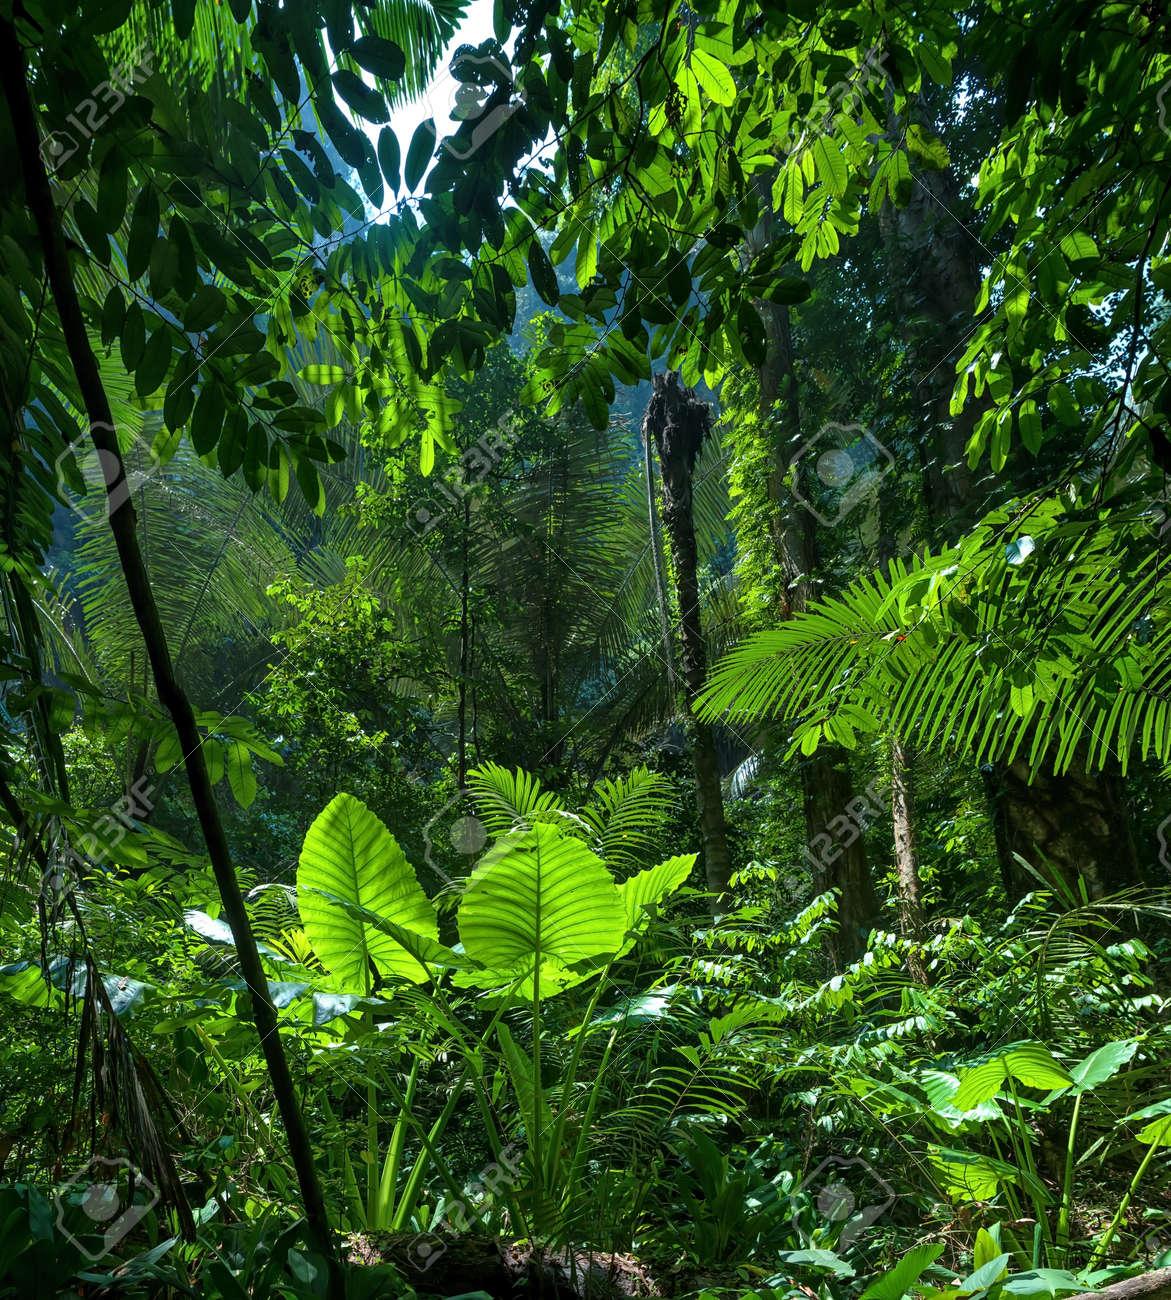 adventure background green jungle forest landscape stock photo